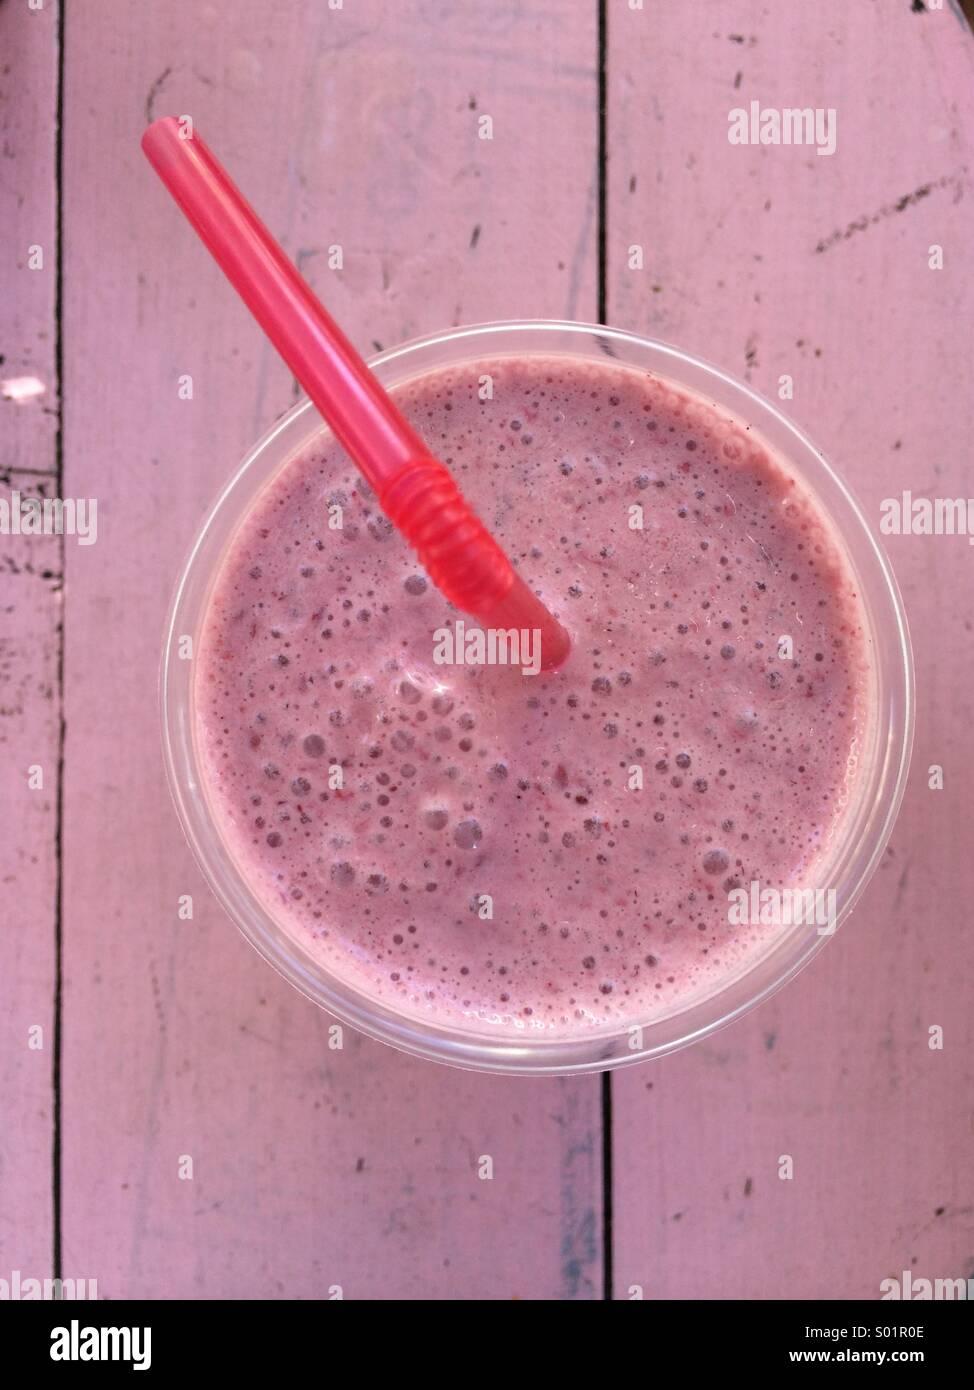 Pink smoothie - Stock Image